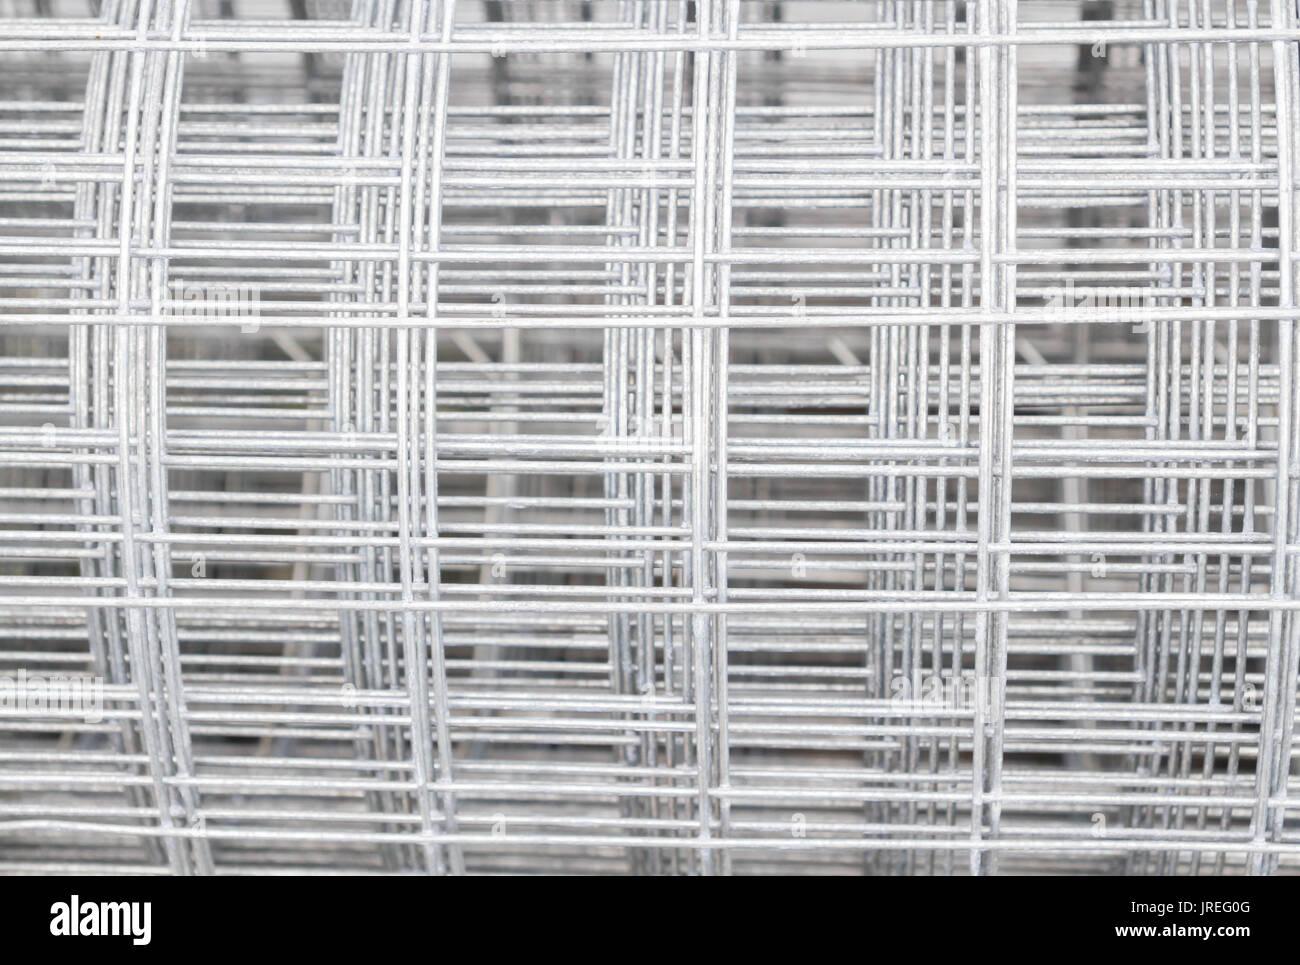 Galvanized Wire Mesh Stock Photos & Galvanized Wire Mesh Stock ...